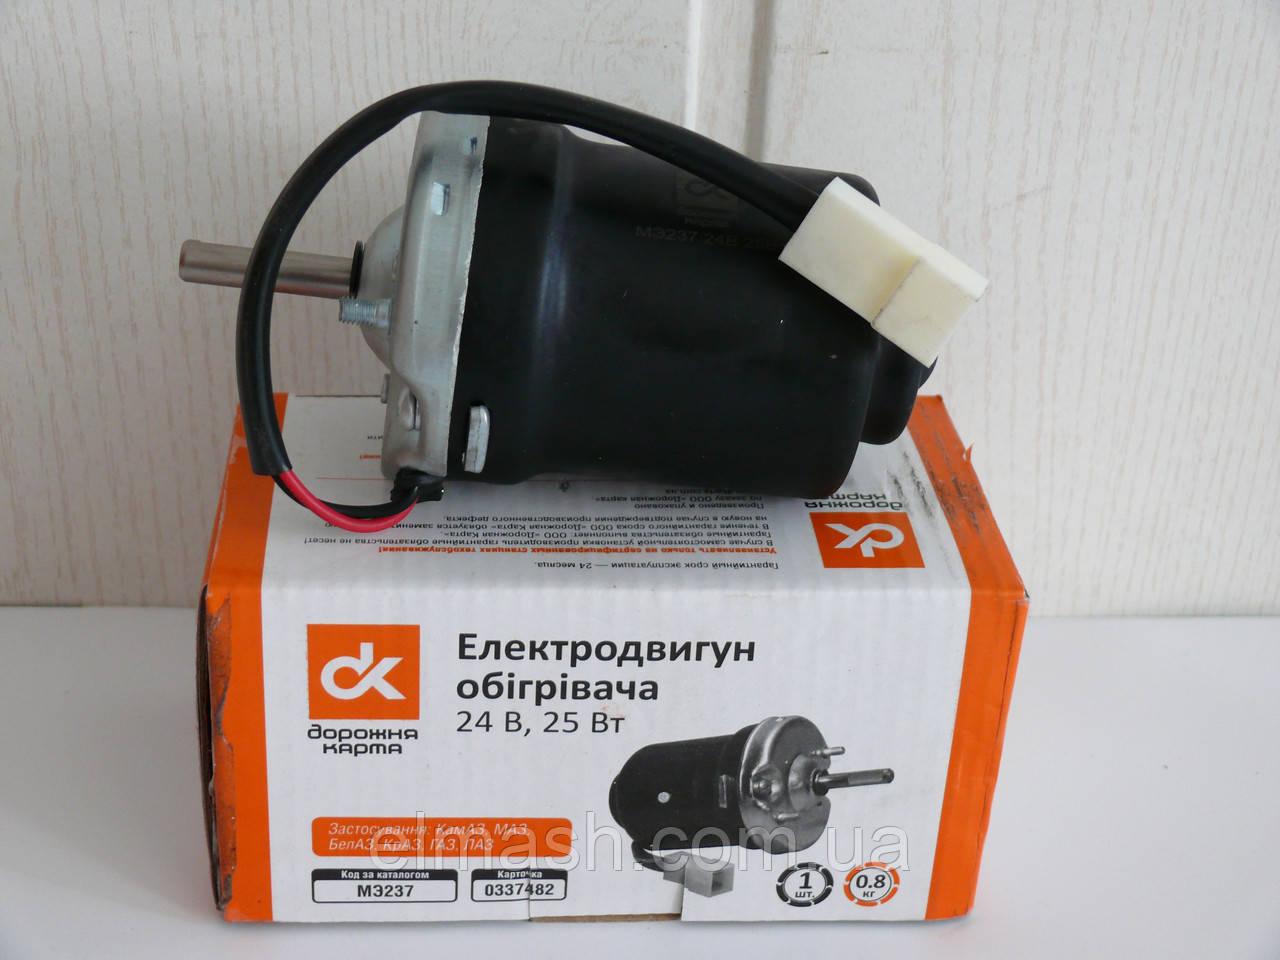 Электродвигатель отопителя КАМАЗ,МАЗ,БЕЛАЗ,КРАЗ,ГАЗ,ЛАЗ 24В 25Вт